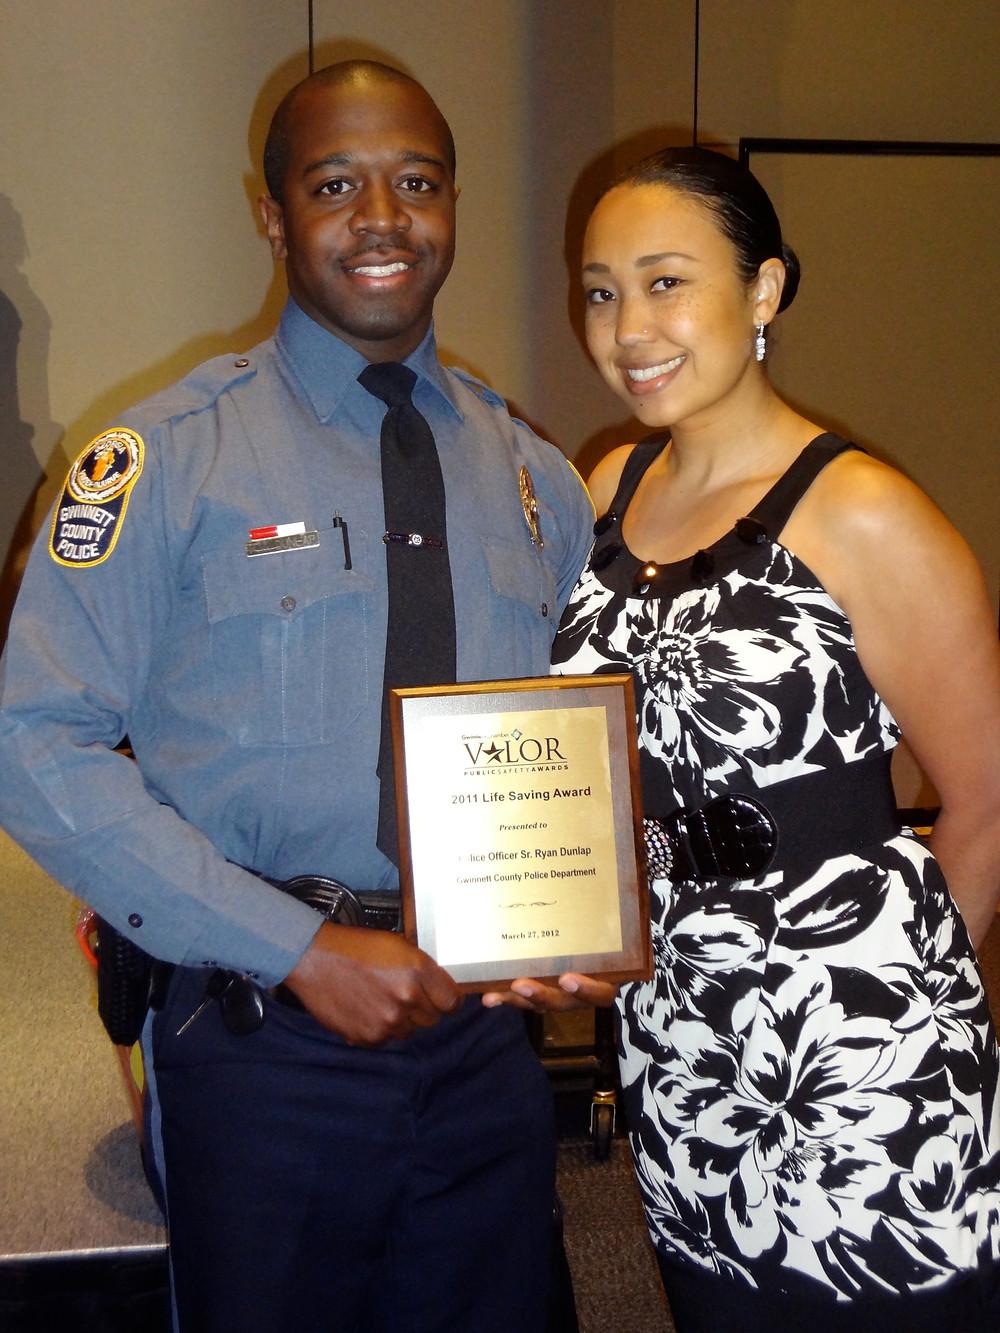 Police officer receives a life saving award